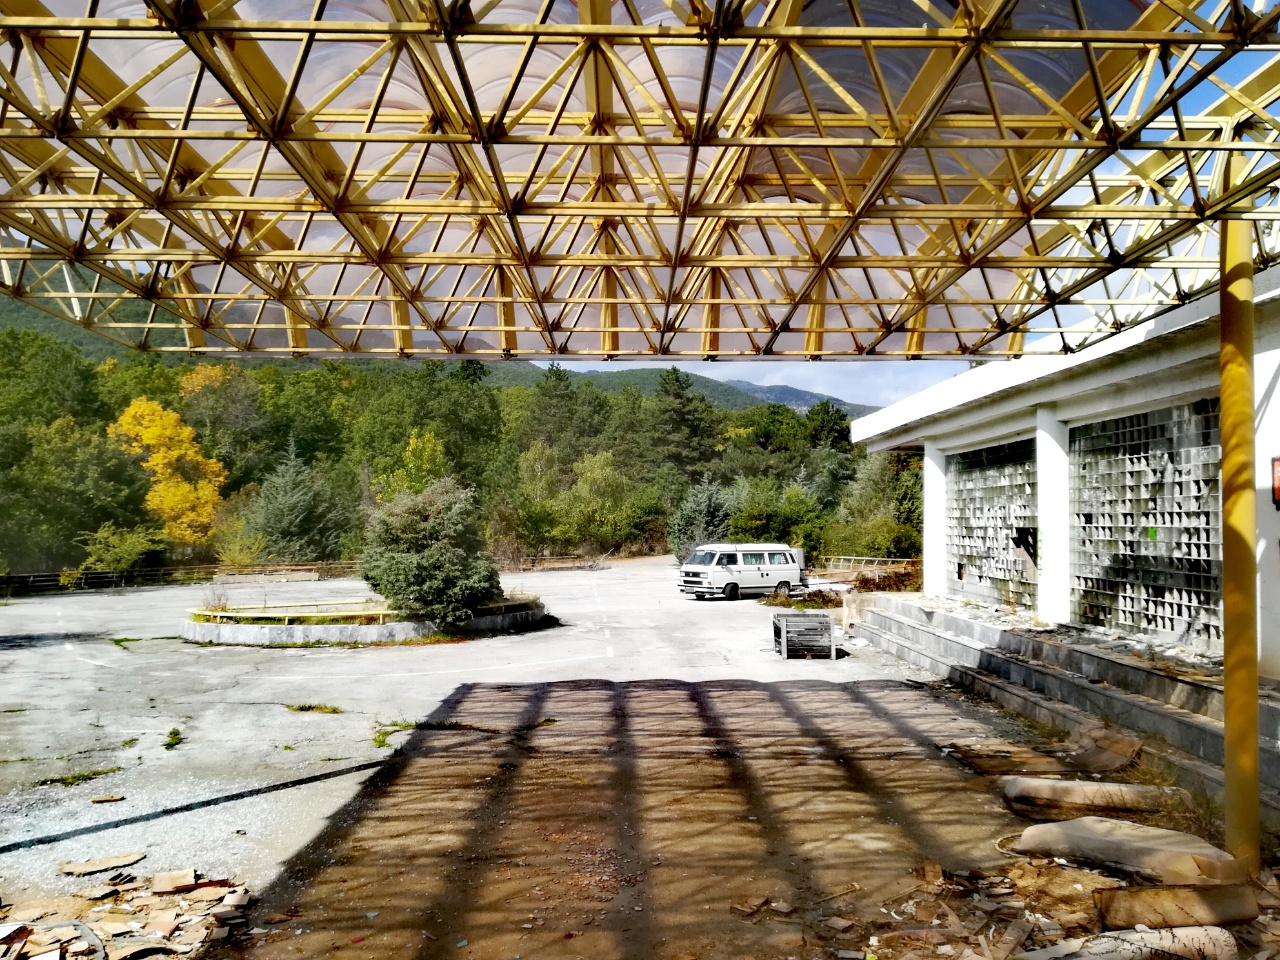 Lost Place Nordmazedonien – Hotel Europa am Prespasee